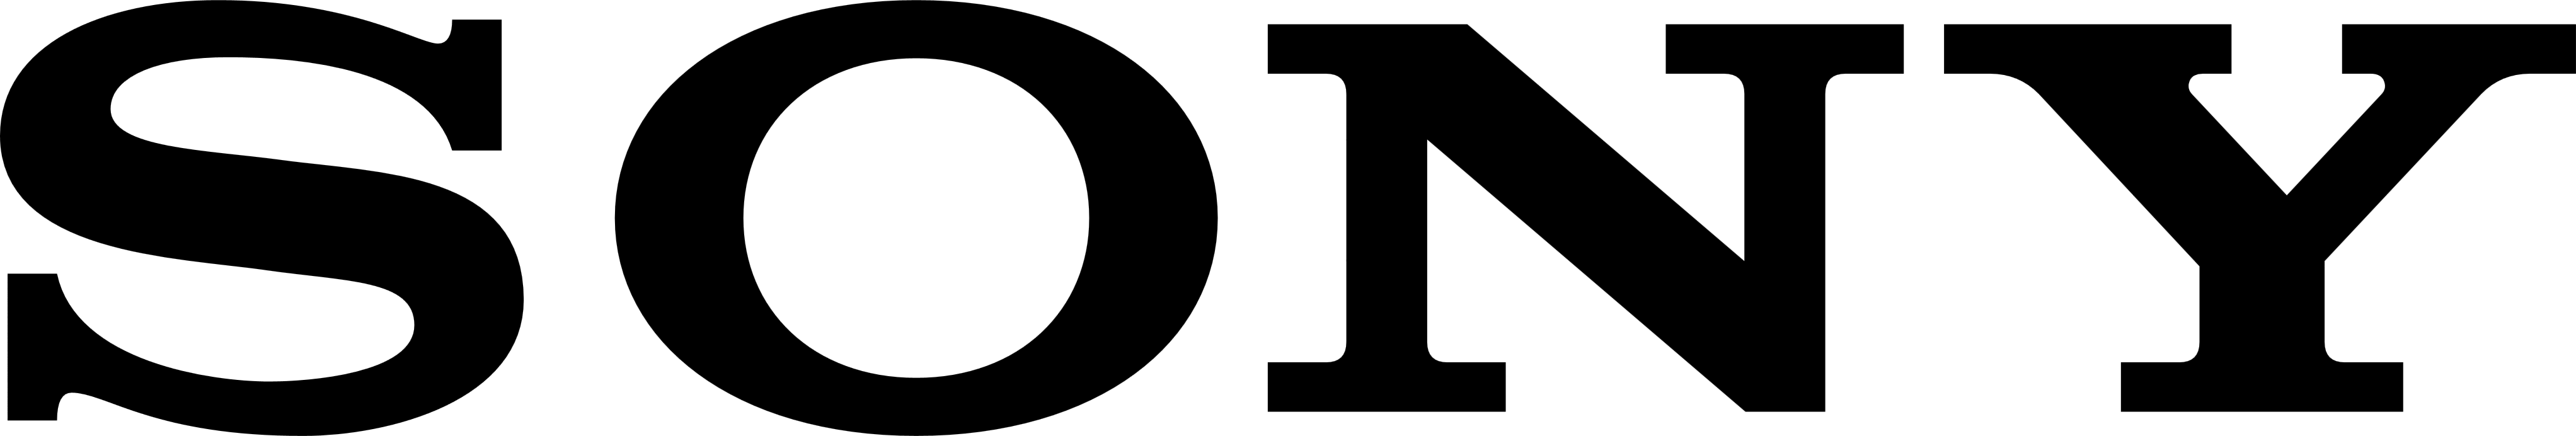 Sony logo current